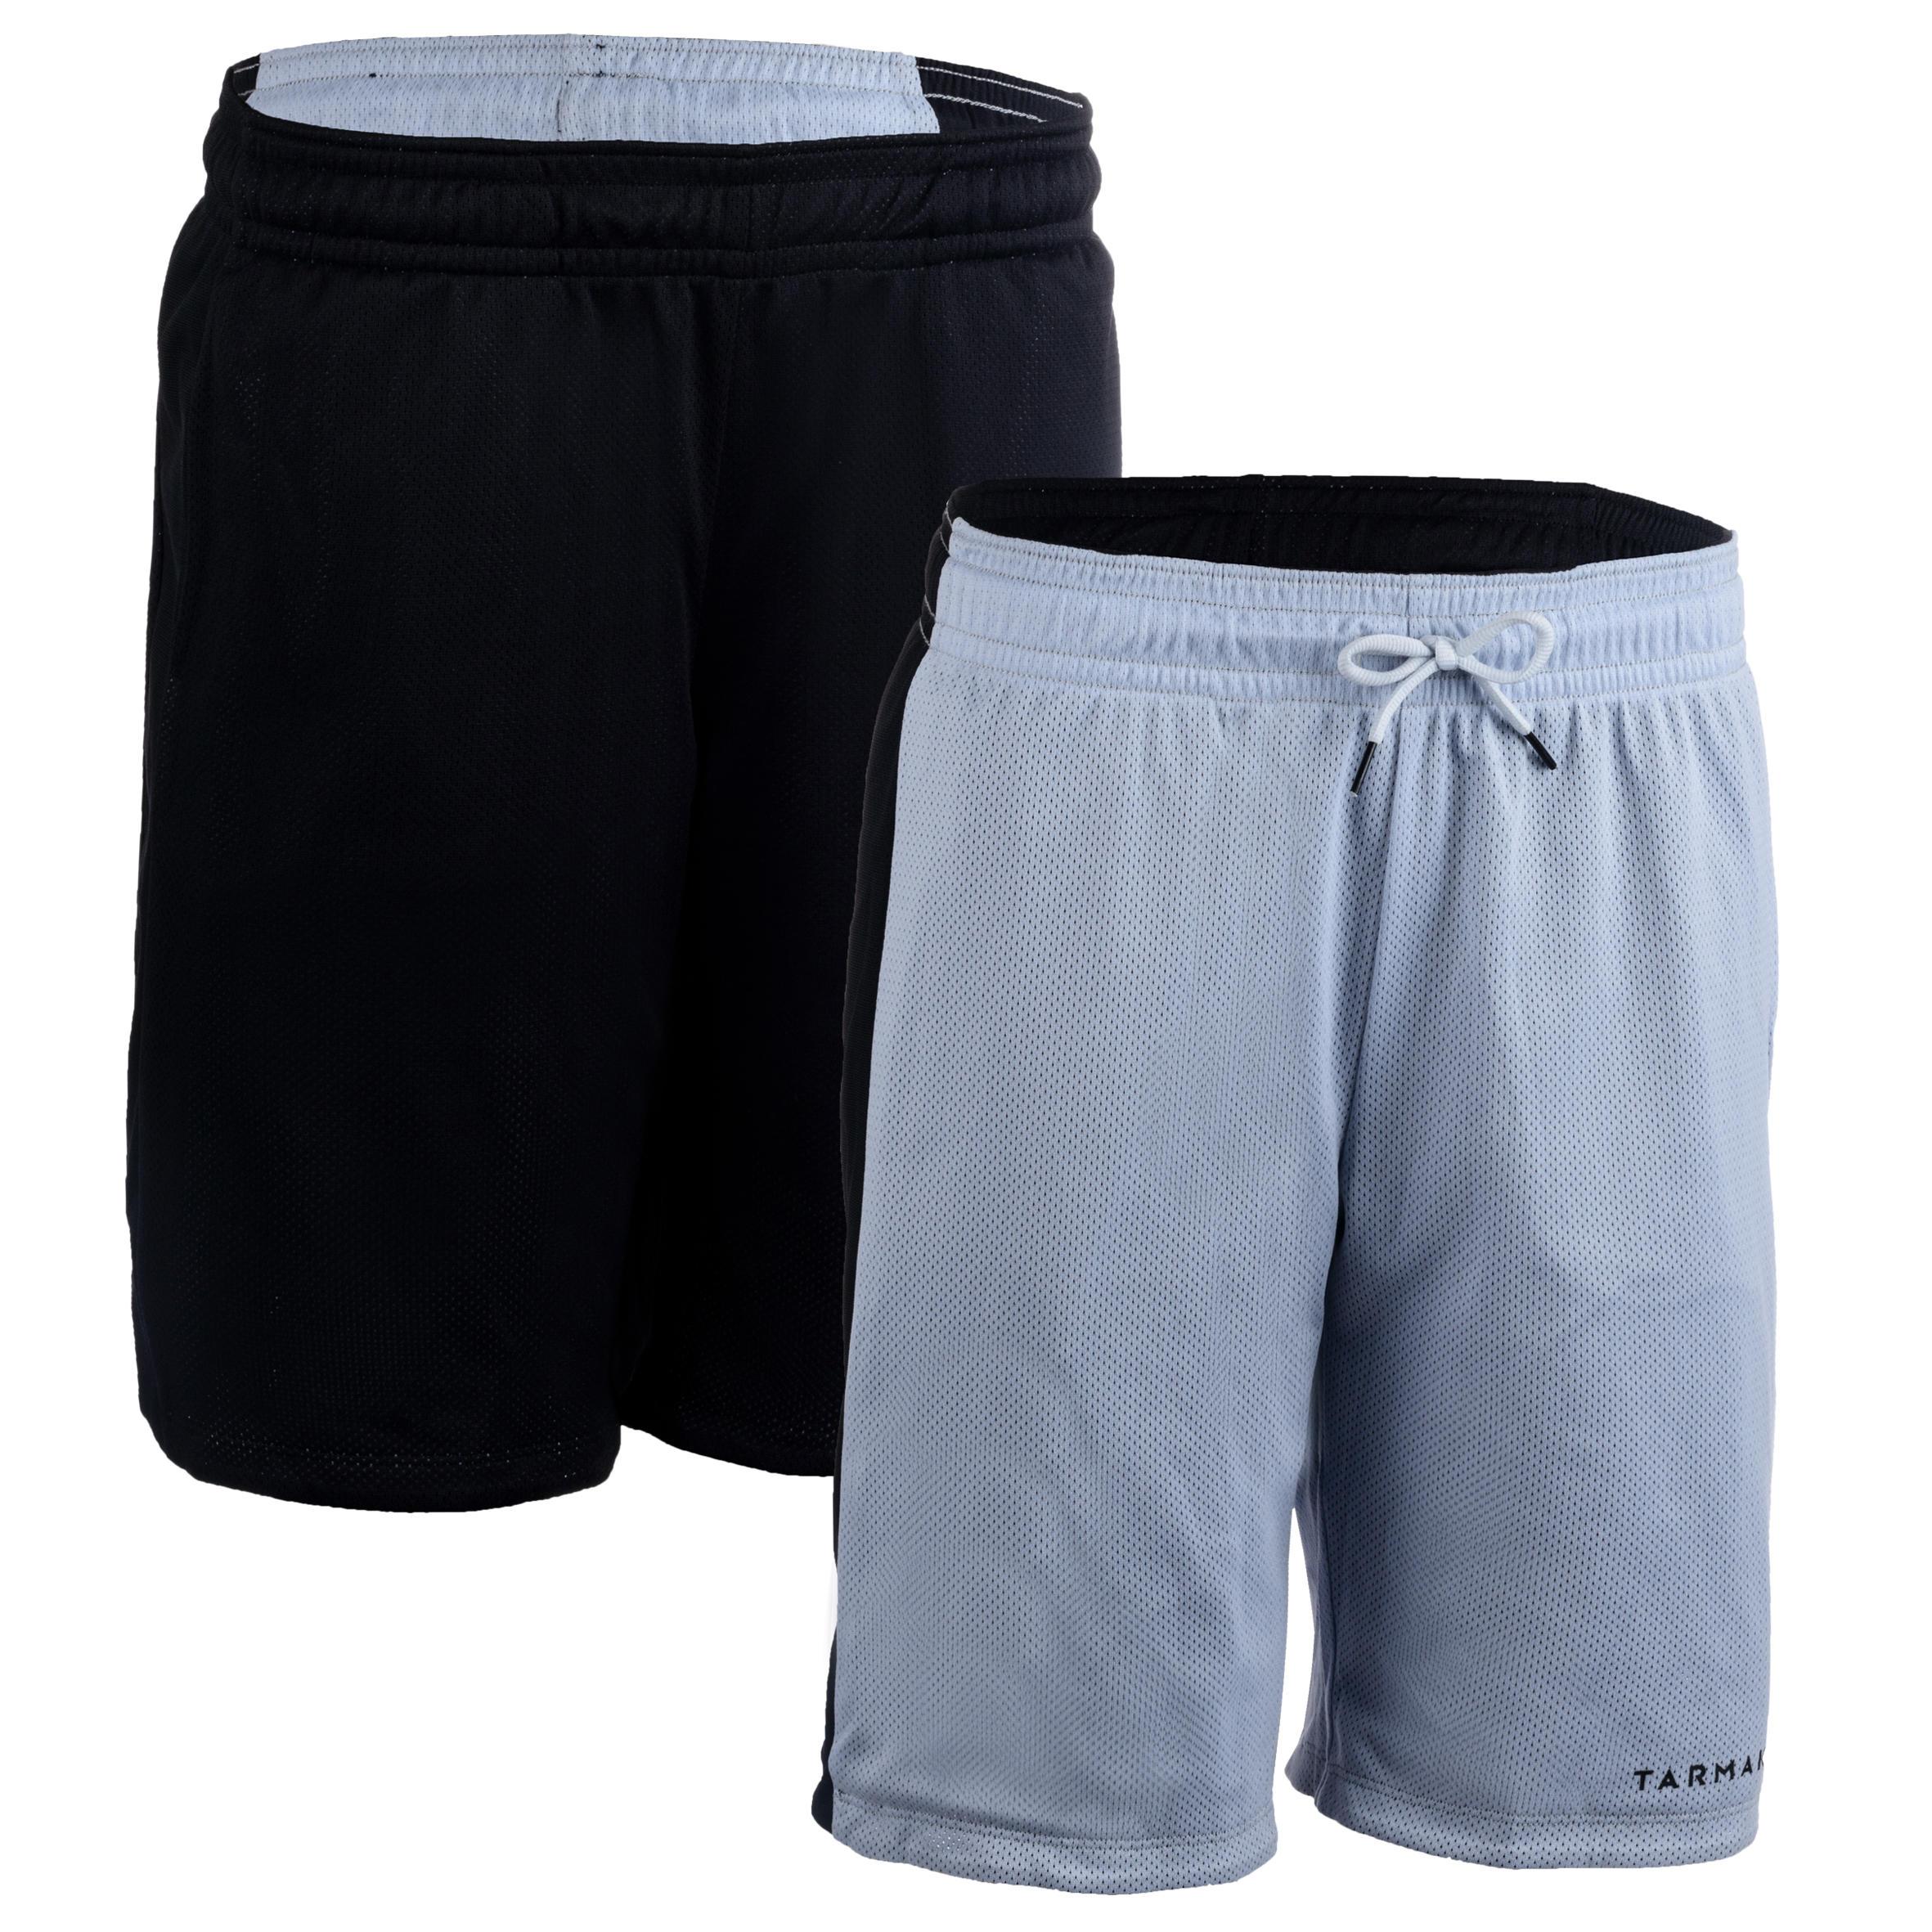 Basketballshorts SH500R Damen schwarz/grau | Sportbekleidung > Sporthosen > Basketballshorts | Tarmak